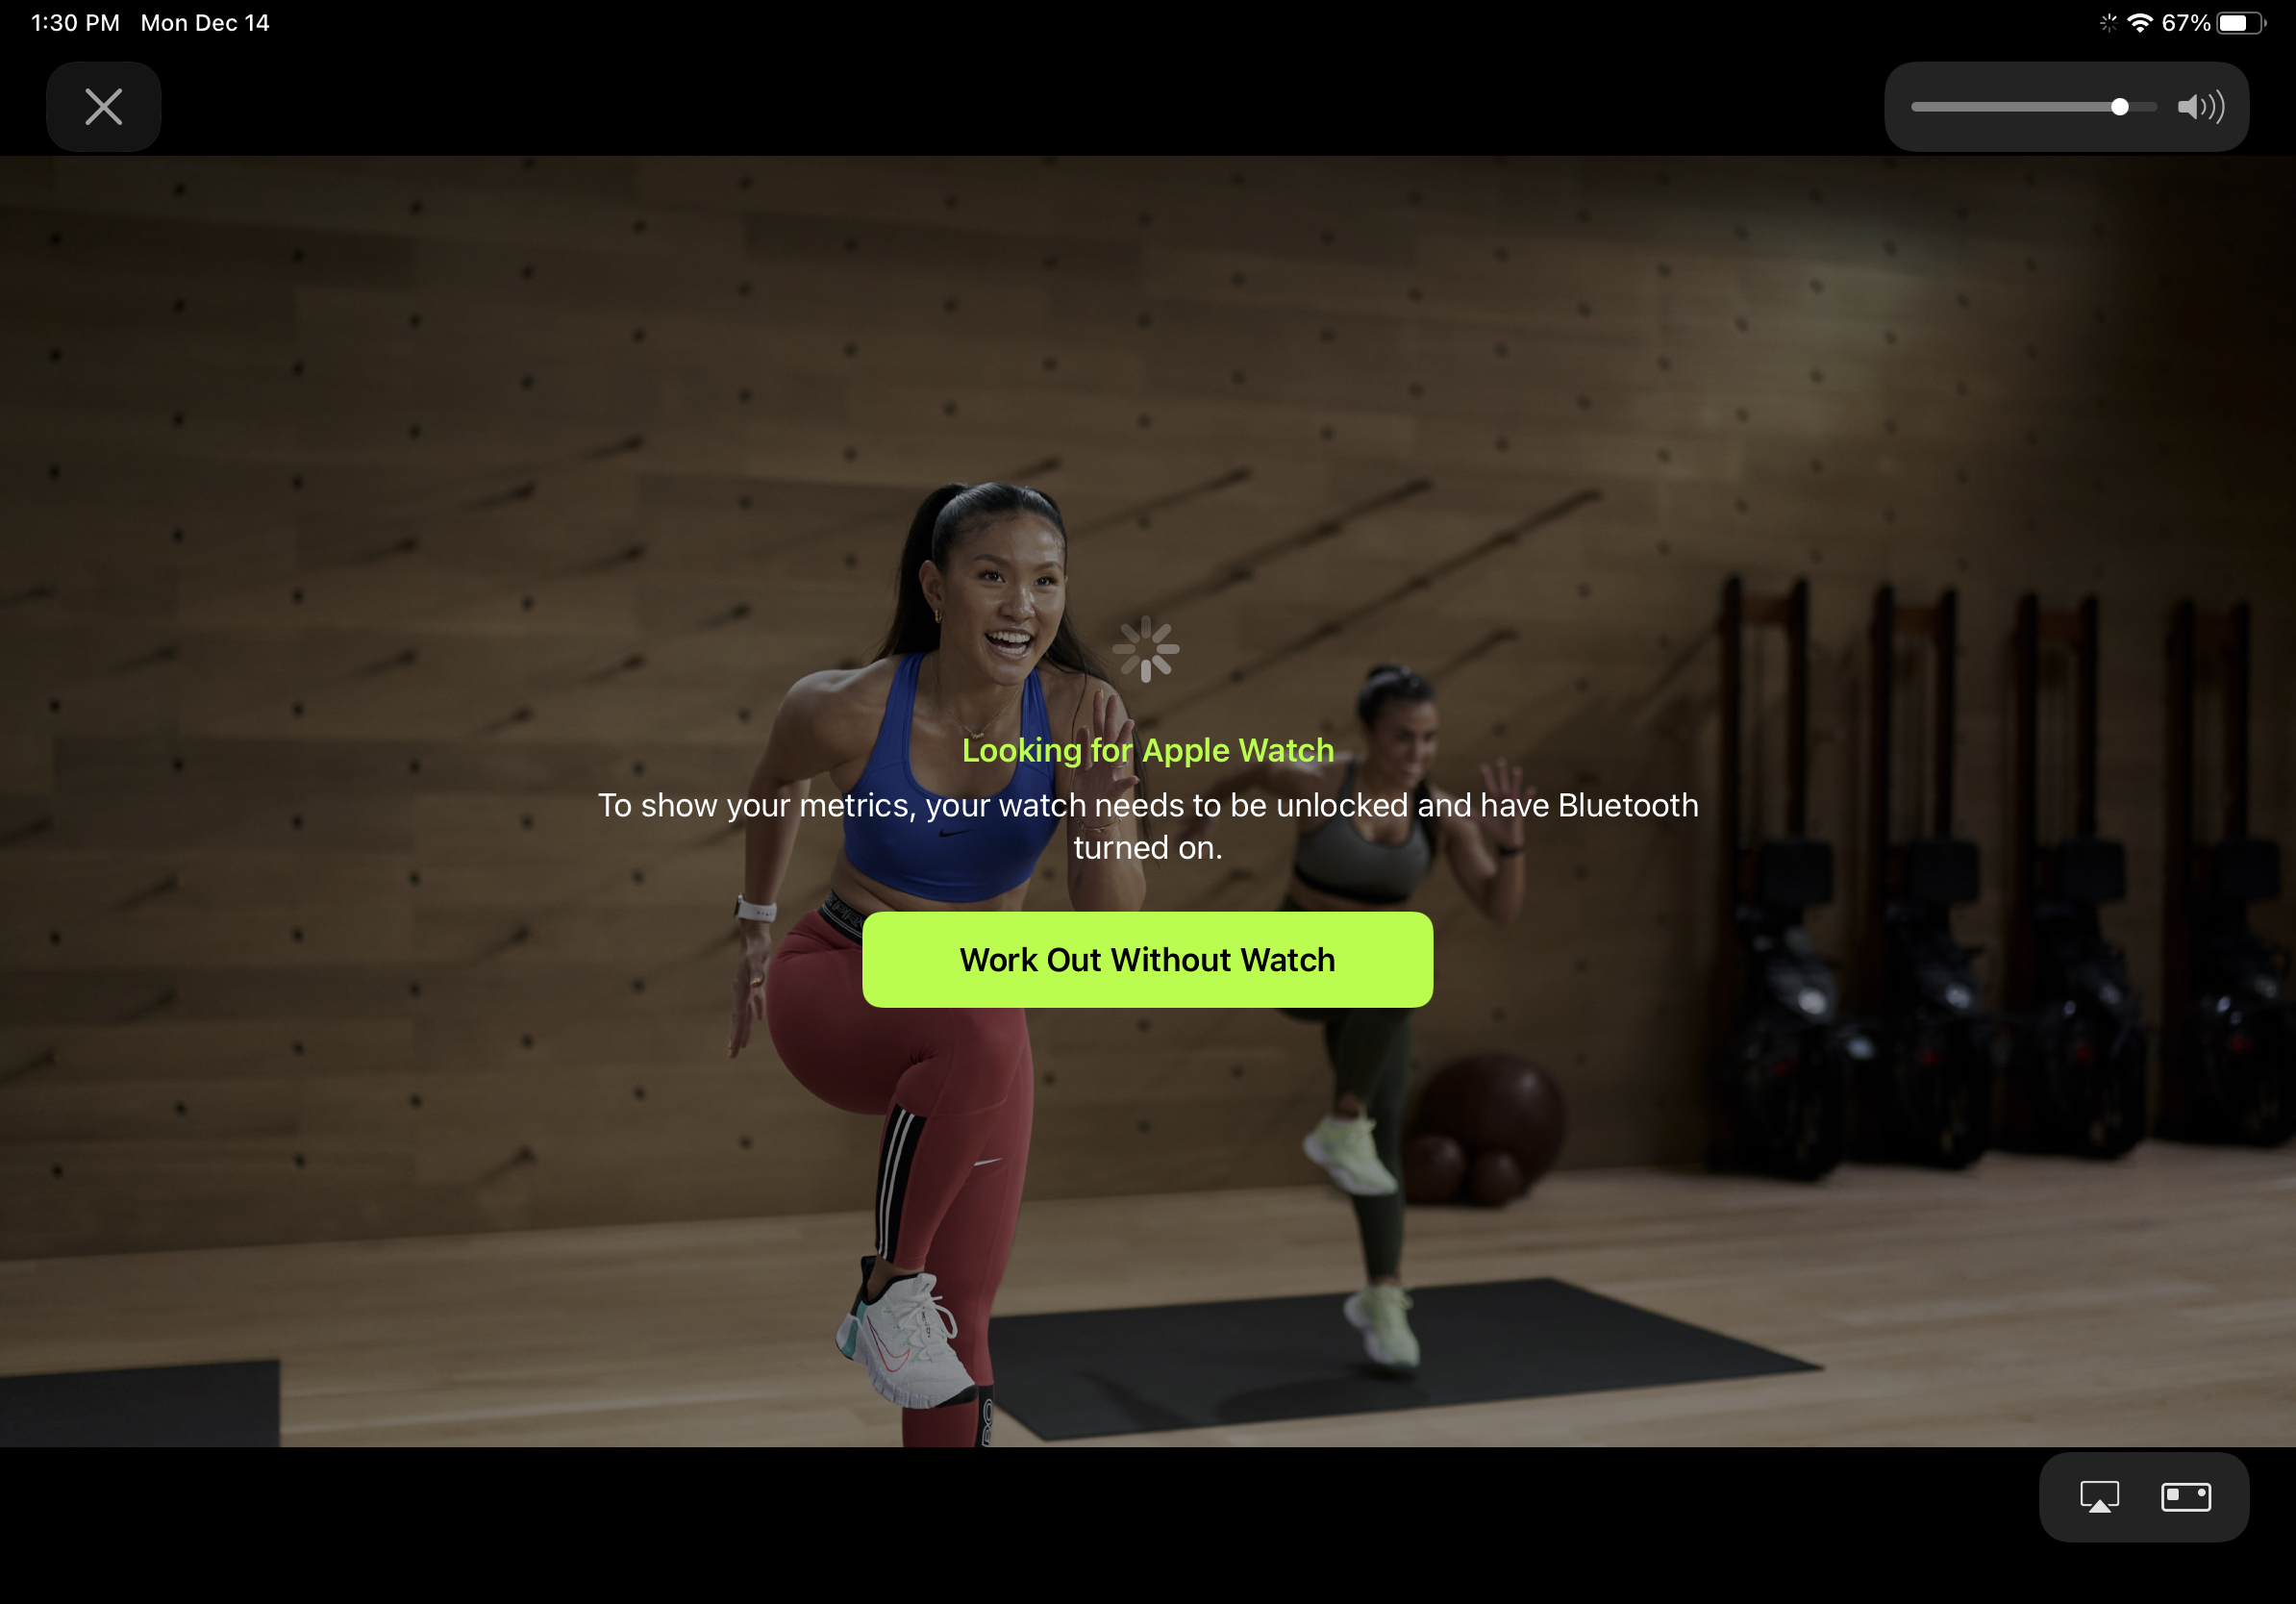 Apple Fitness Plus details Apple Watch requirement